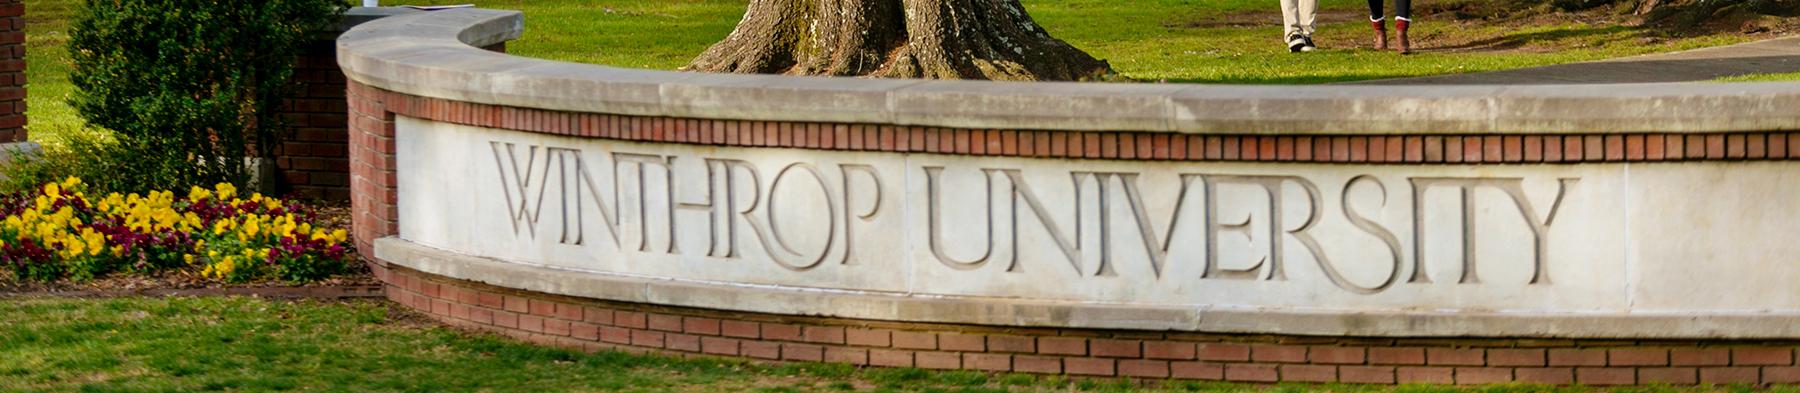 Winthrop University - Entrance